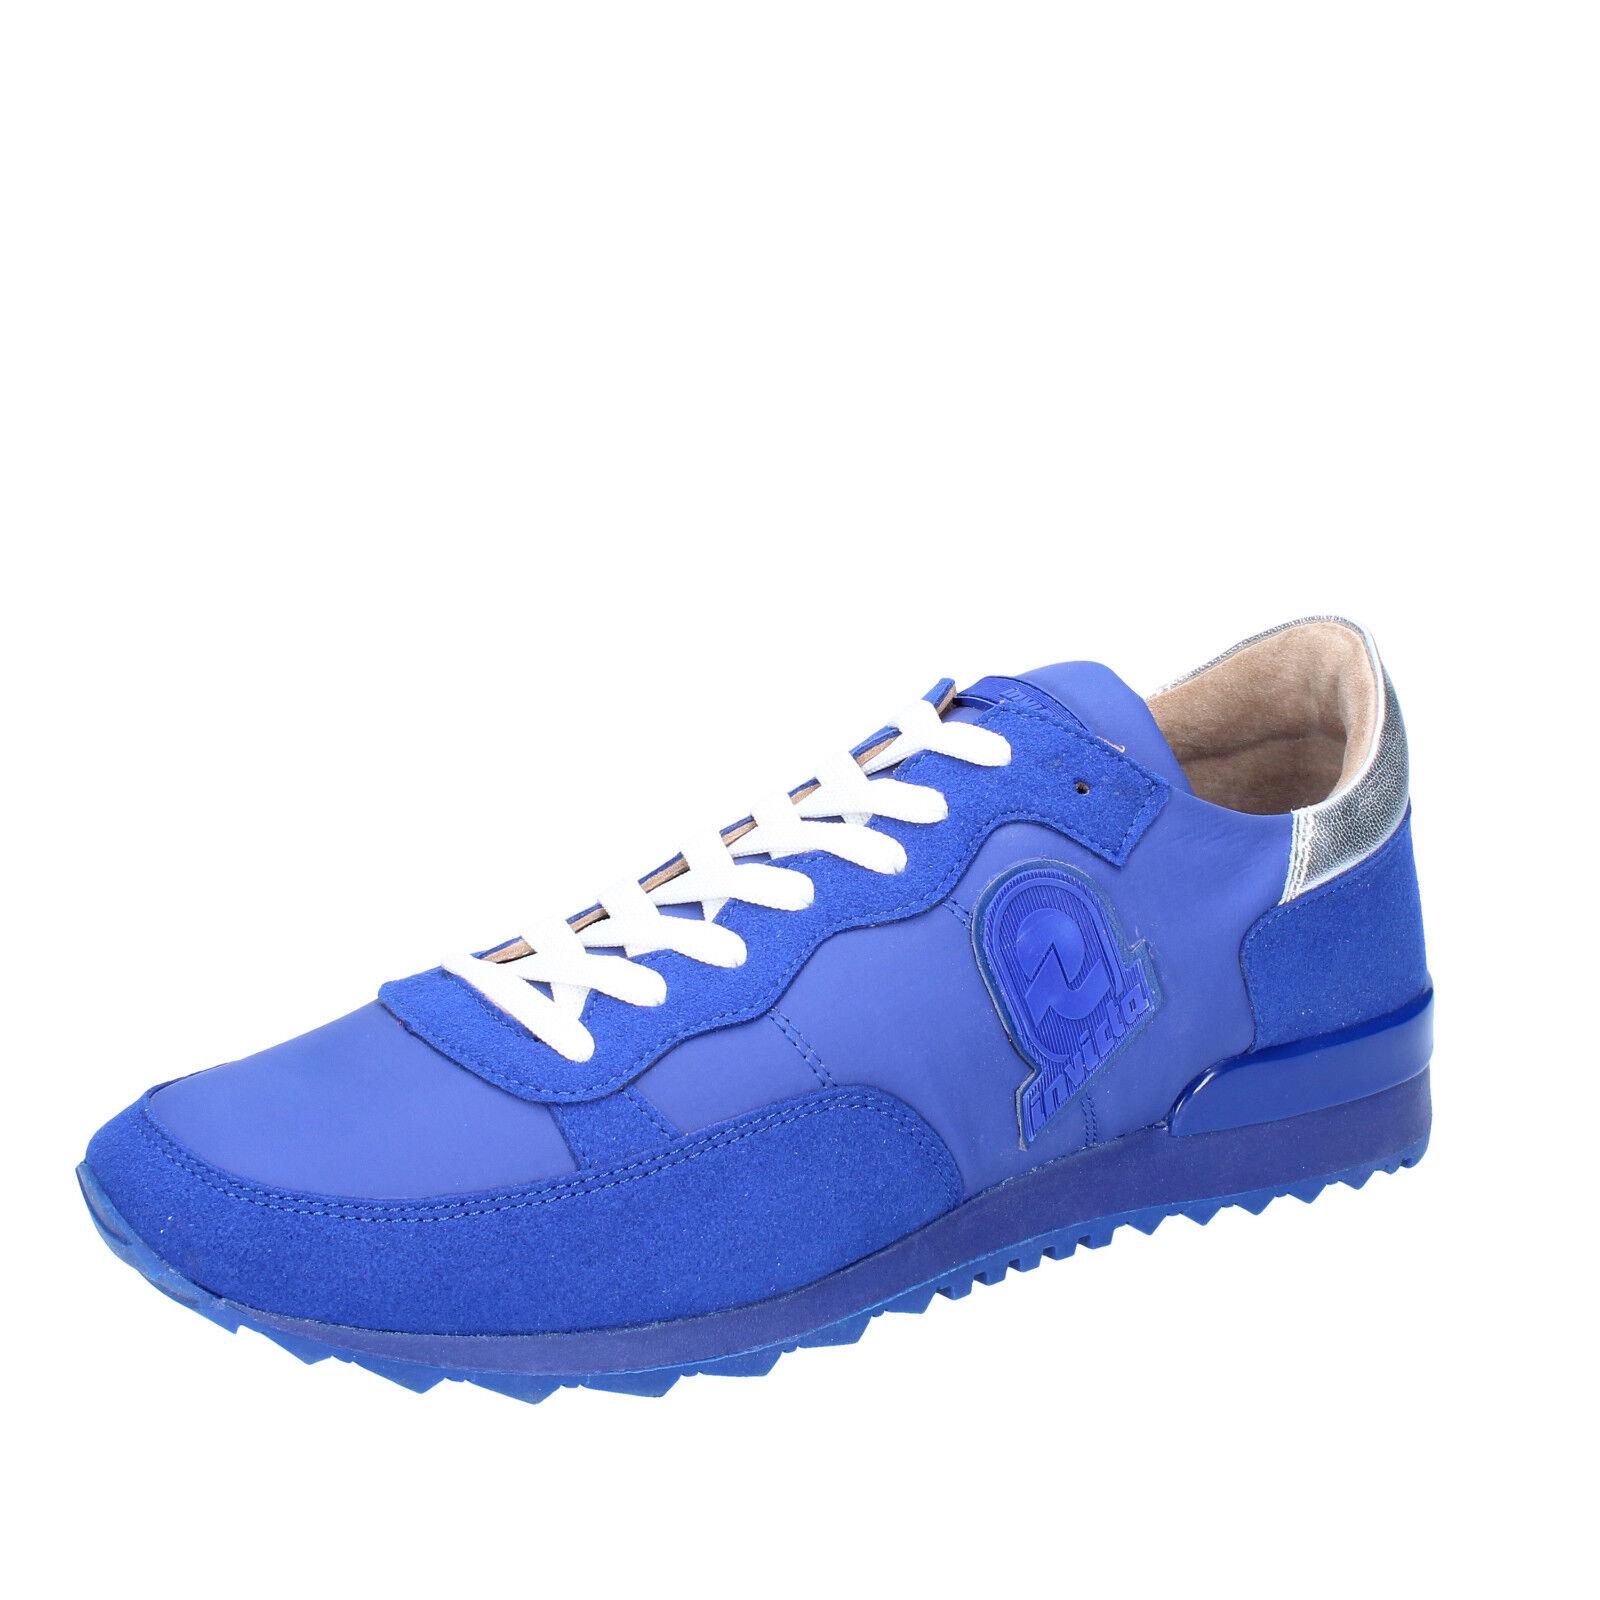 Mens shoes INVICTA 6 (EU 40) sneakers purple suede textile AB864-40